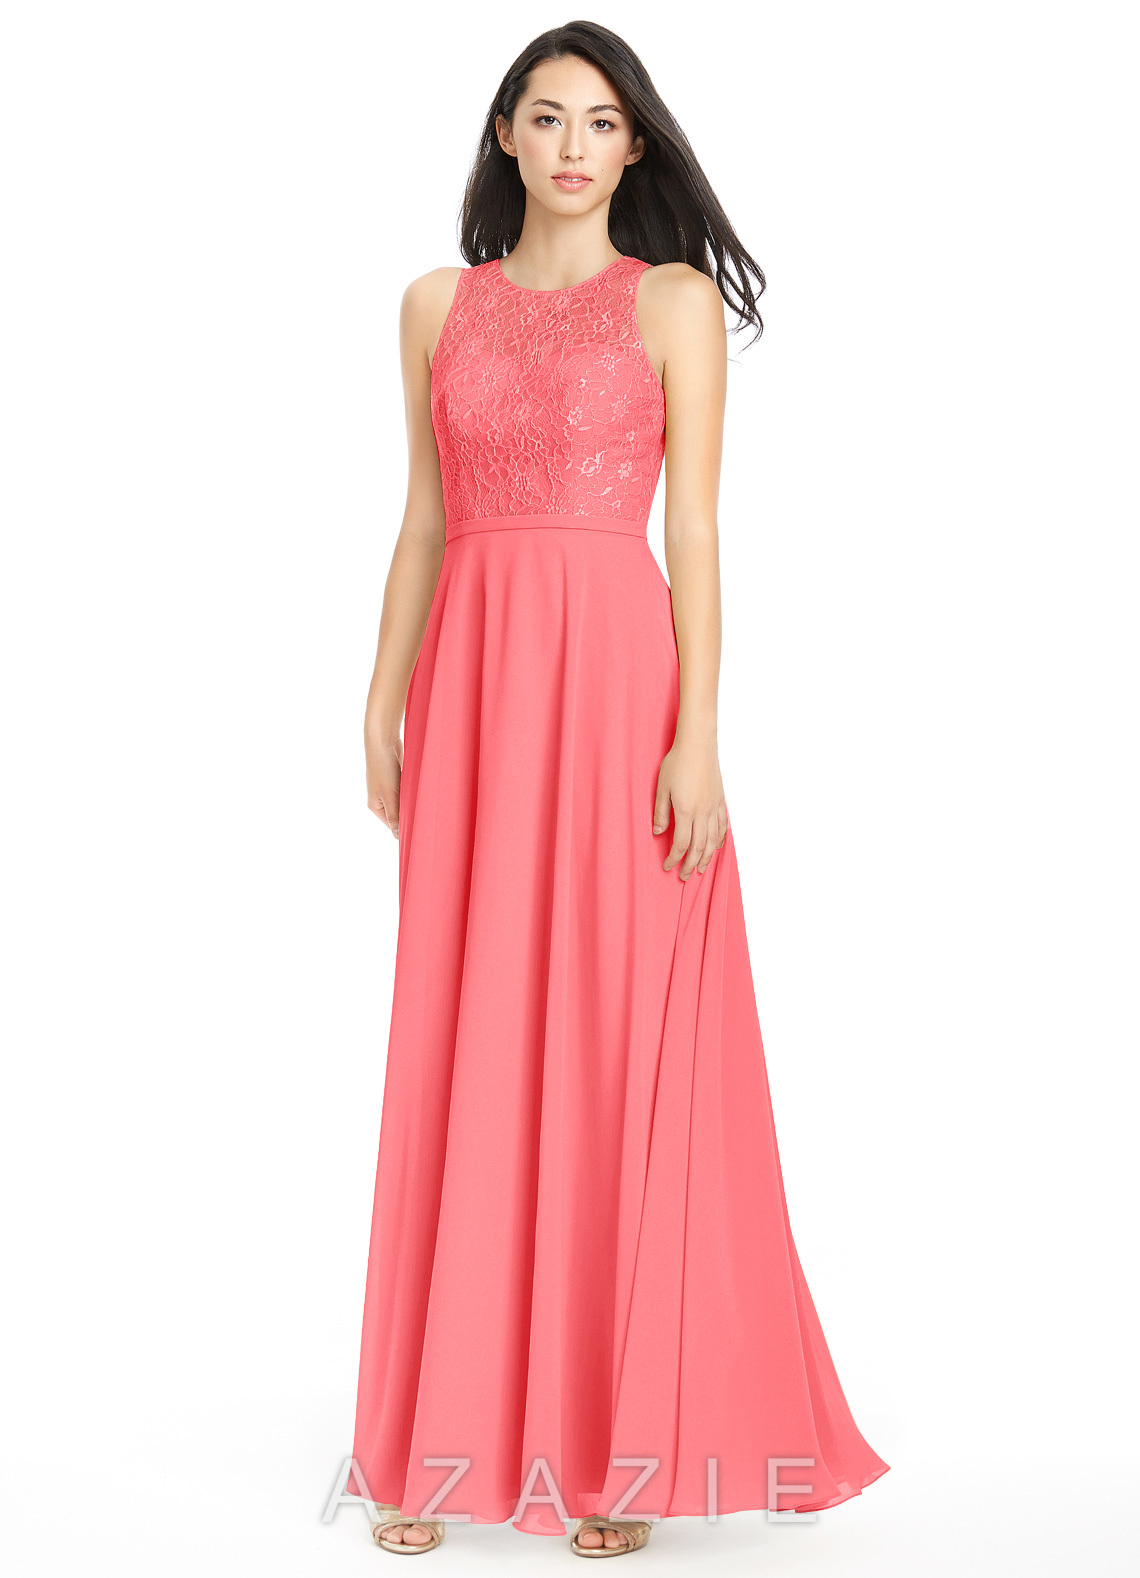 Azazie frederica bridesmaid dress azazie color watermelon ombrellifo Images